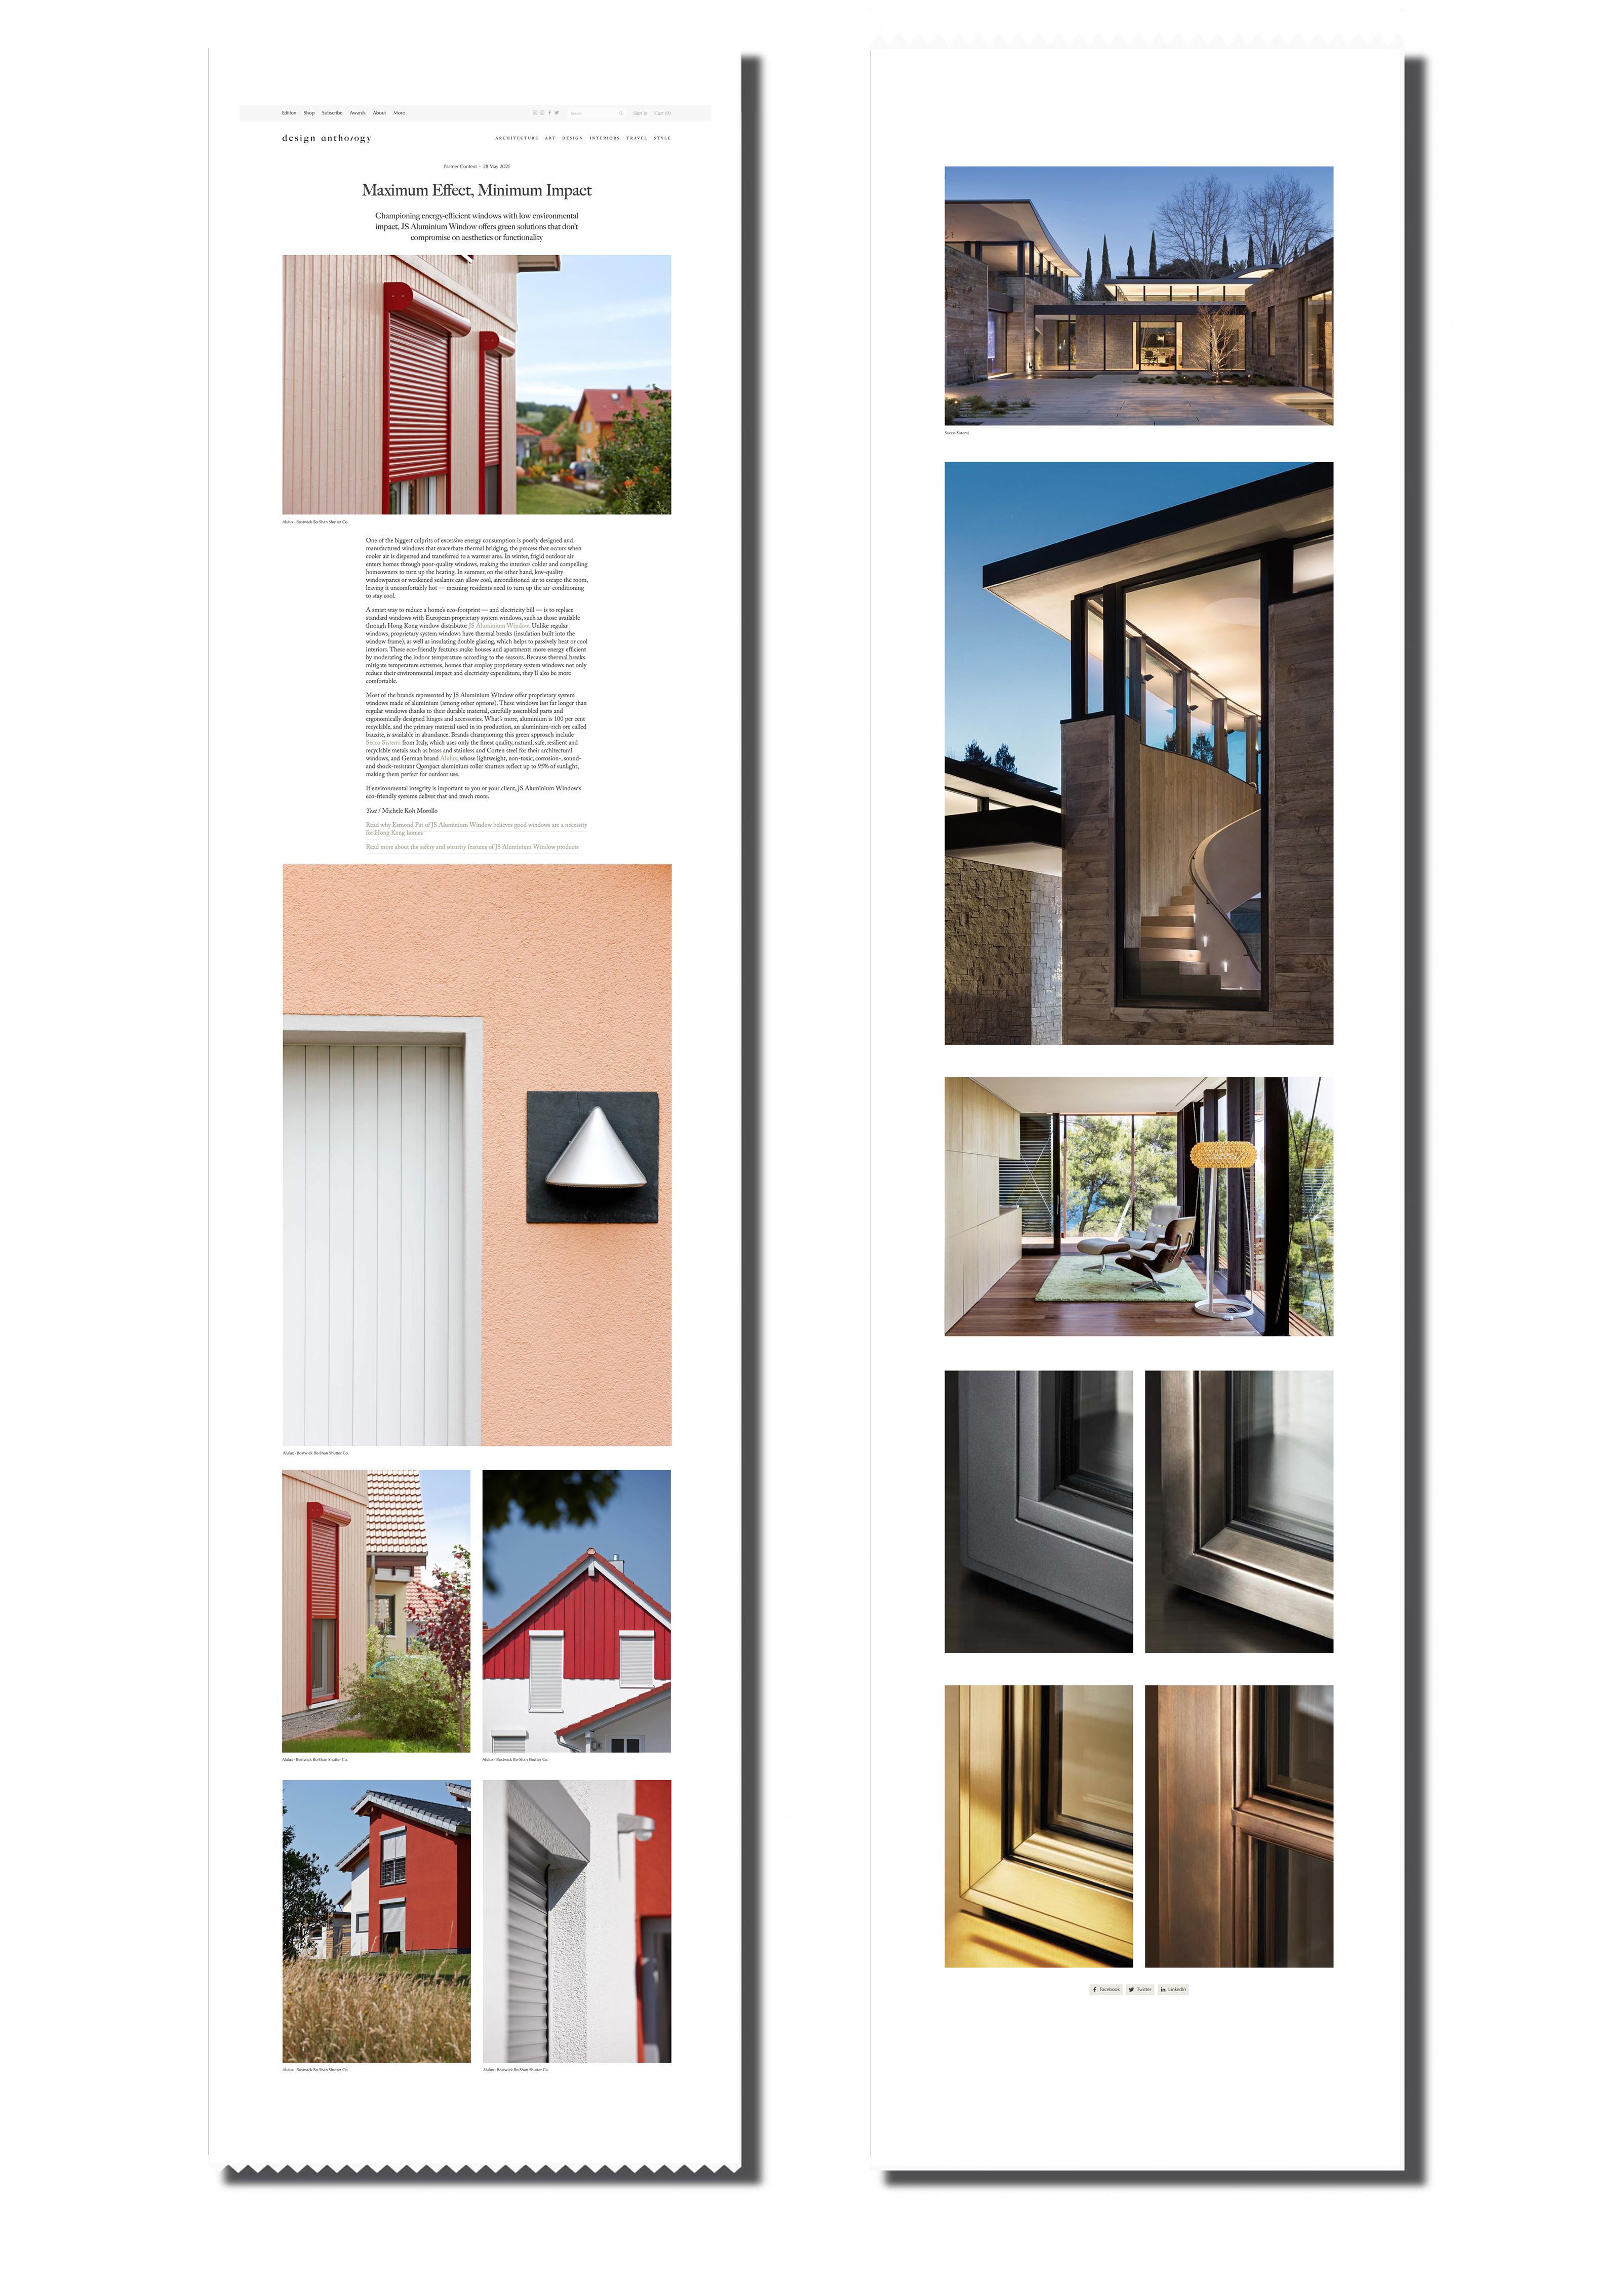 JS - Aluminium Windows in Hong Kong 高級歐洲鋁窗代理 - coverage on design anthology